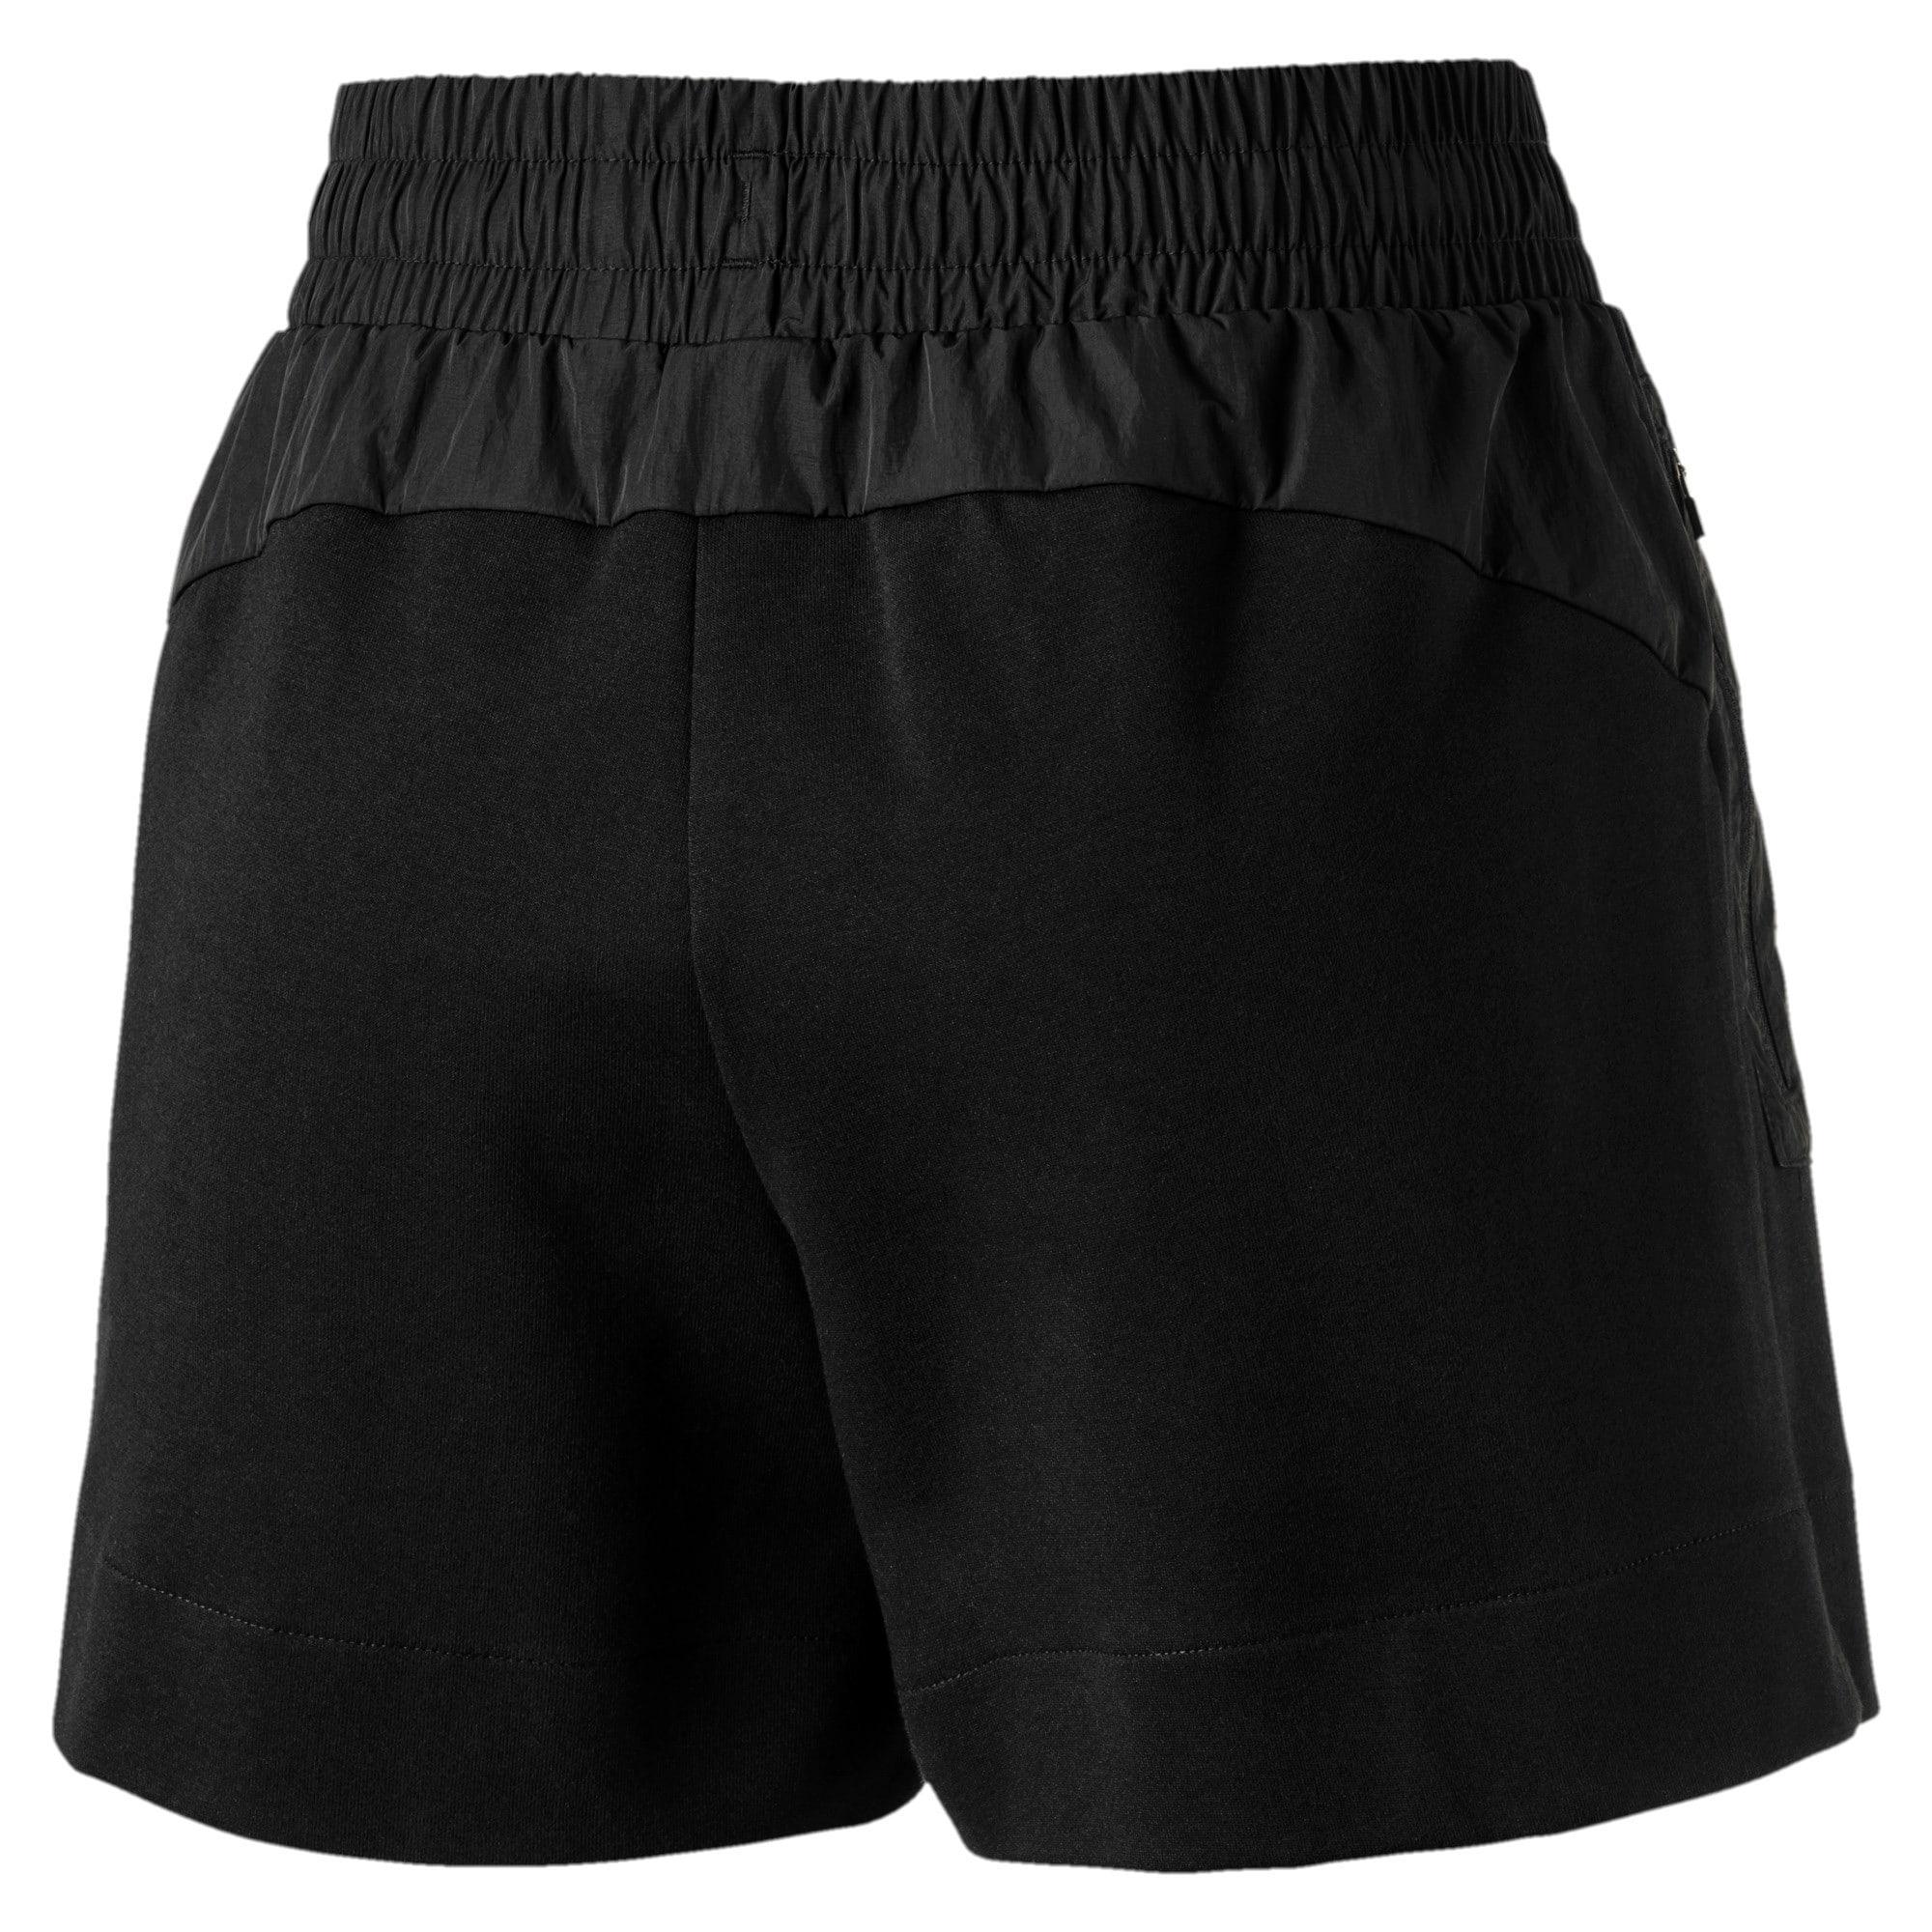 Thumbnail 5 of Evostripe Lite Women's Shorts, Cotton Black, medium